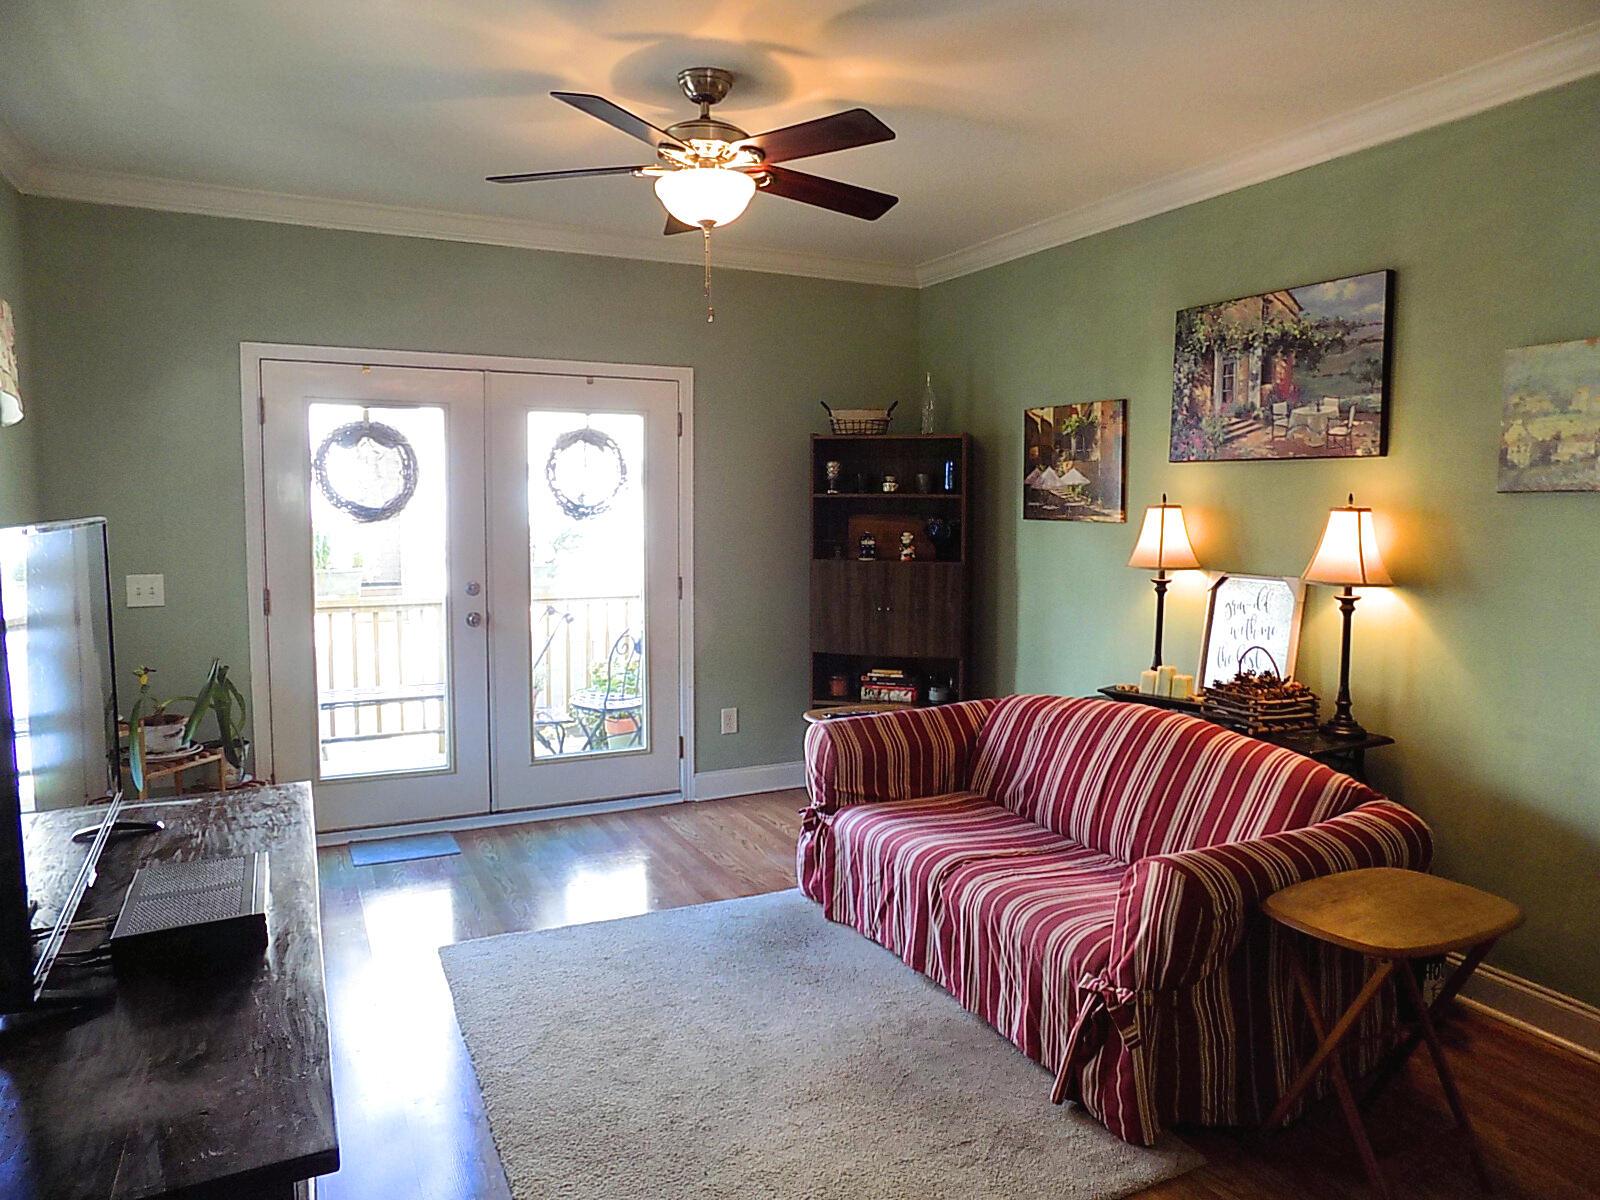 Willow Oaks Homes For Sale - 1829 Dogwood, Charleston, SC - 25